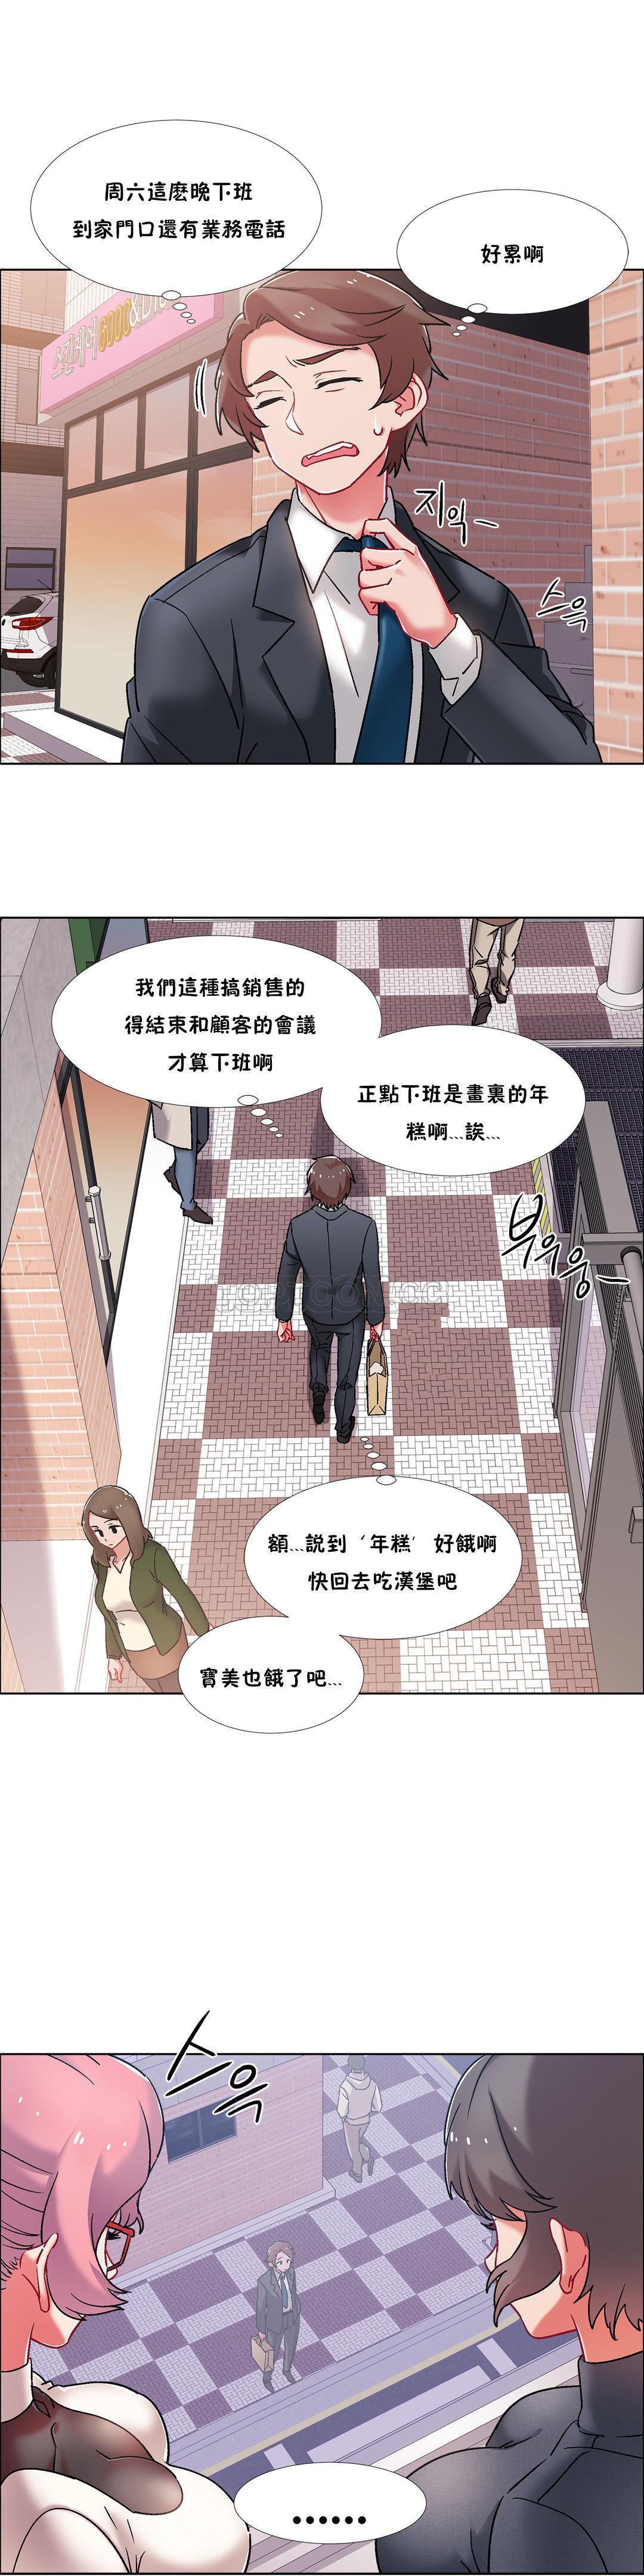 [Studio Wannabe] Rental Girls | 出租女郎 Ch. 33-58 [Chinese]  第二季 完结 235